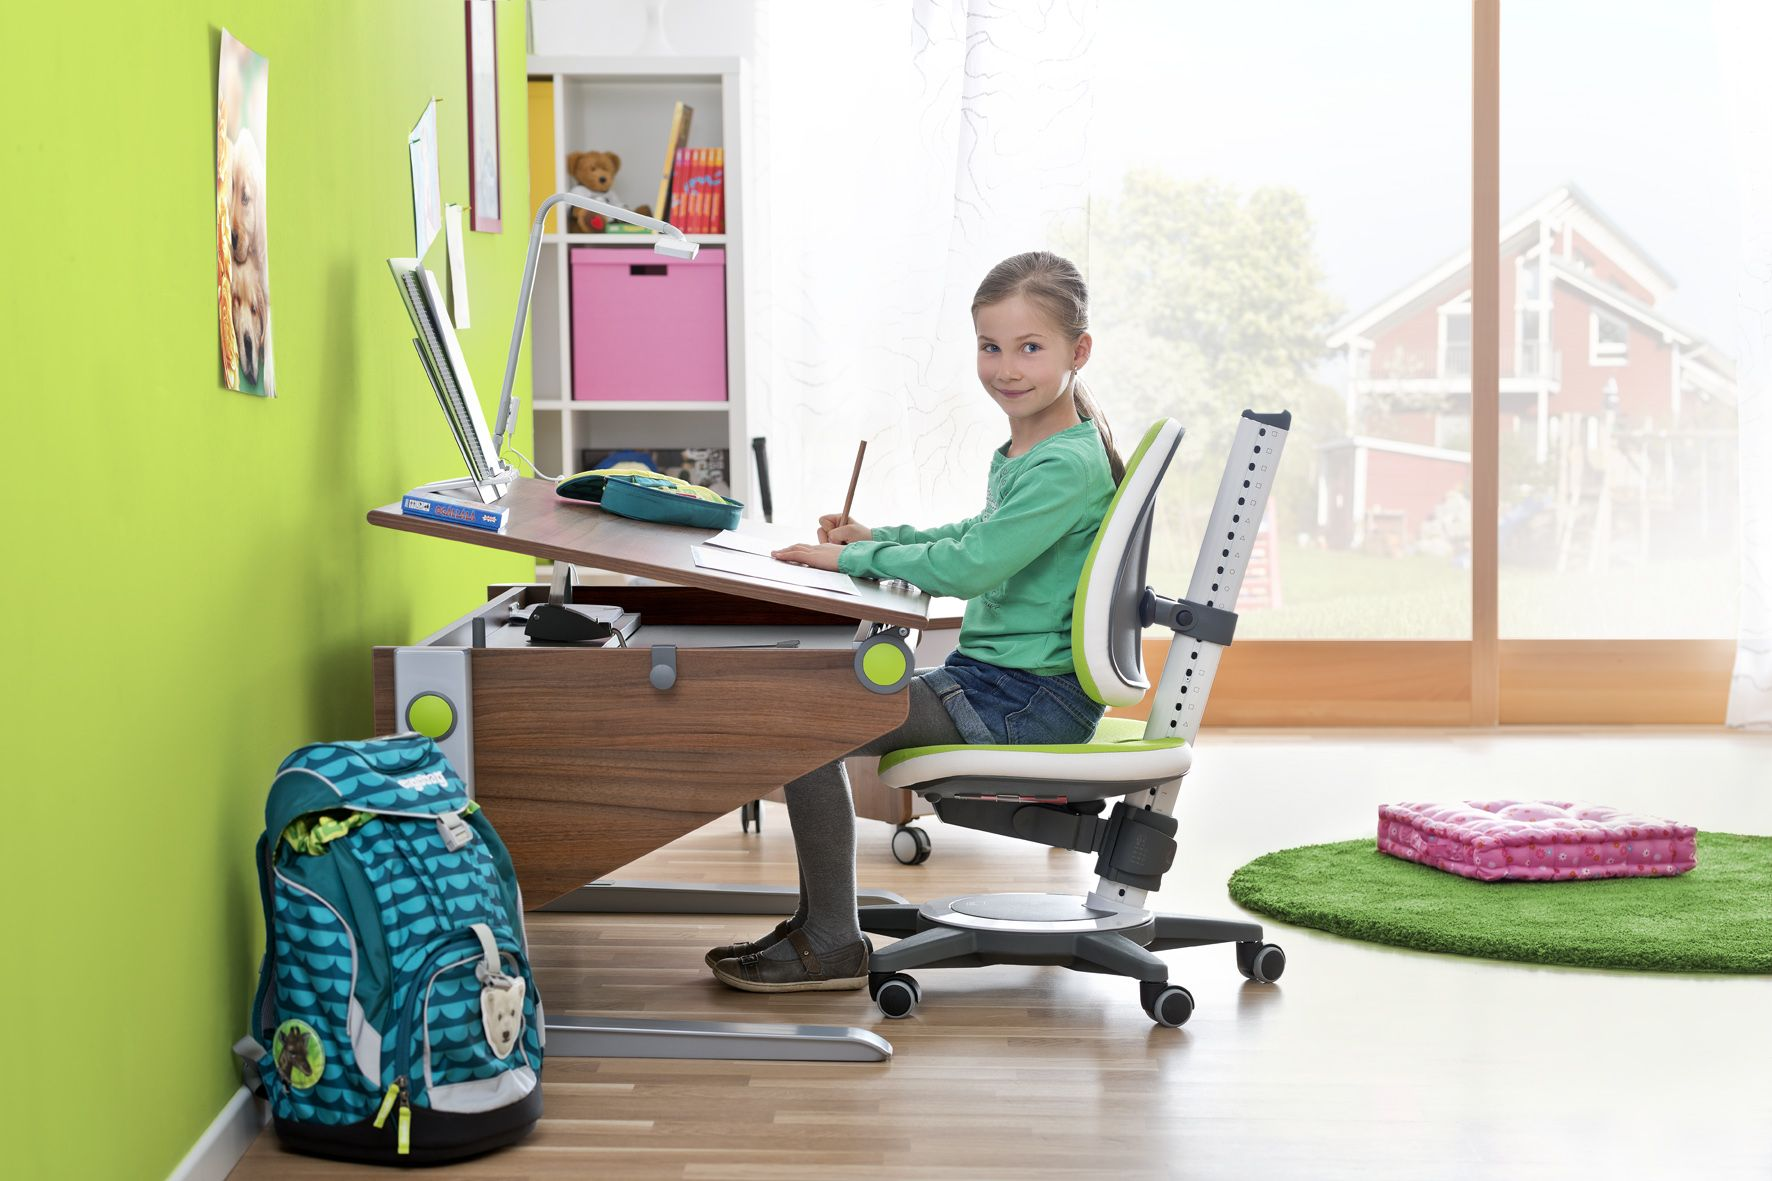 moll New Basic WINNER Ergonomic Desk with the moll